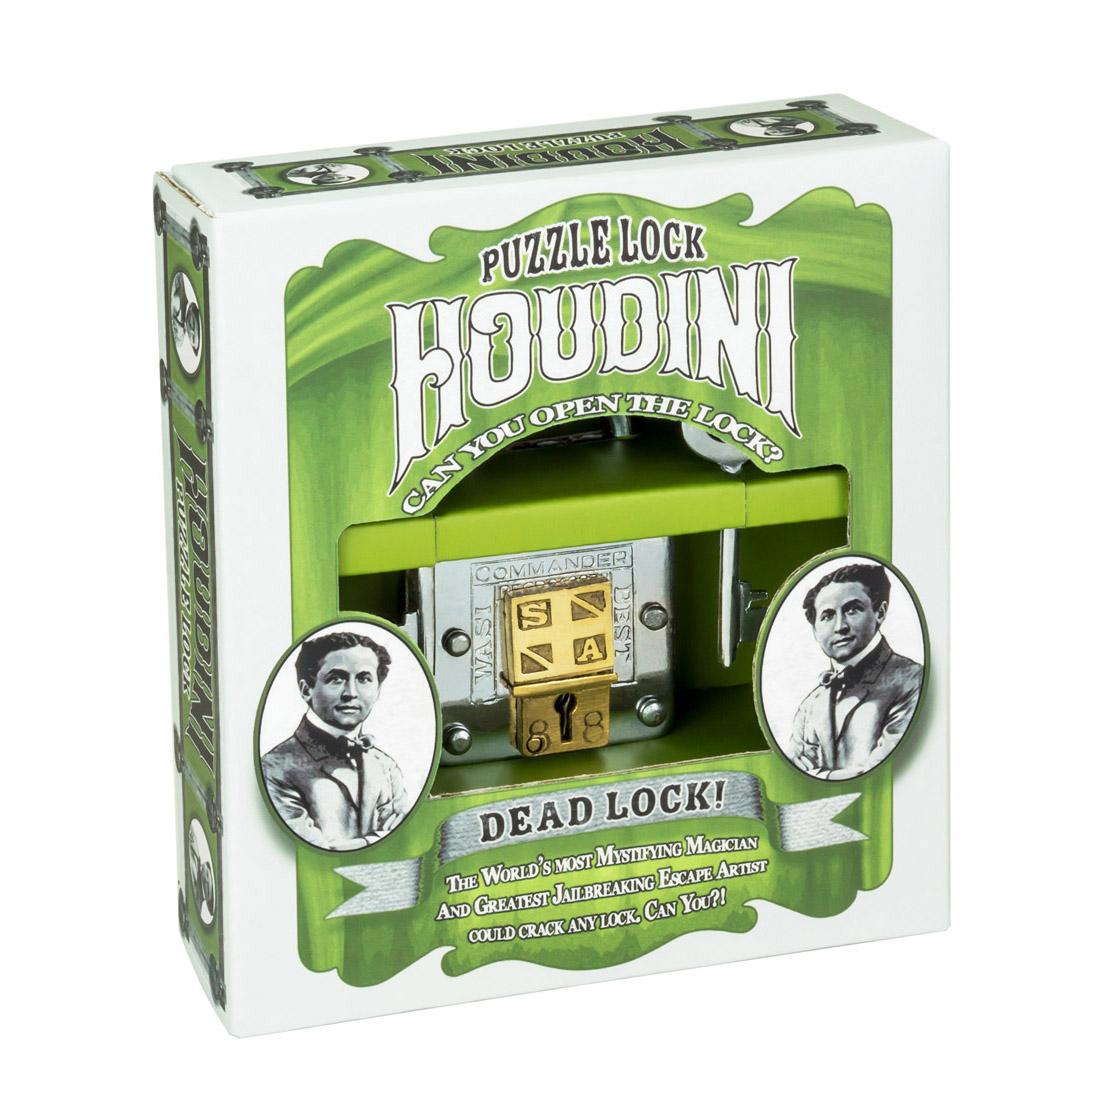 1069 - Houdini - Dead Lock